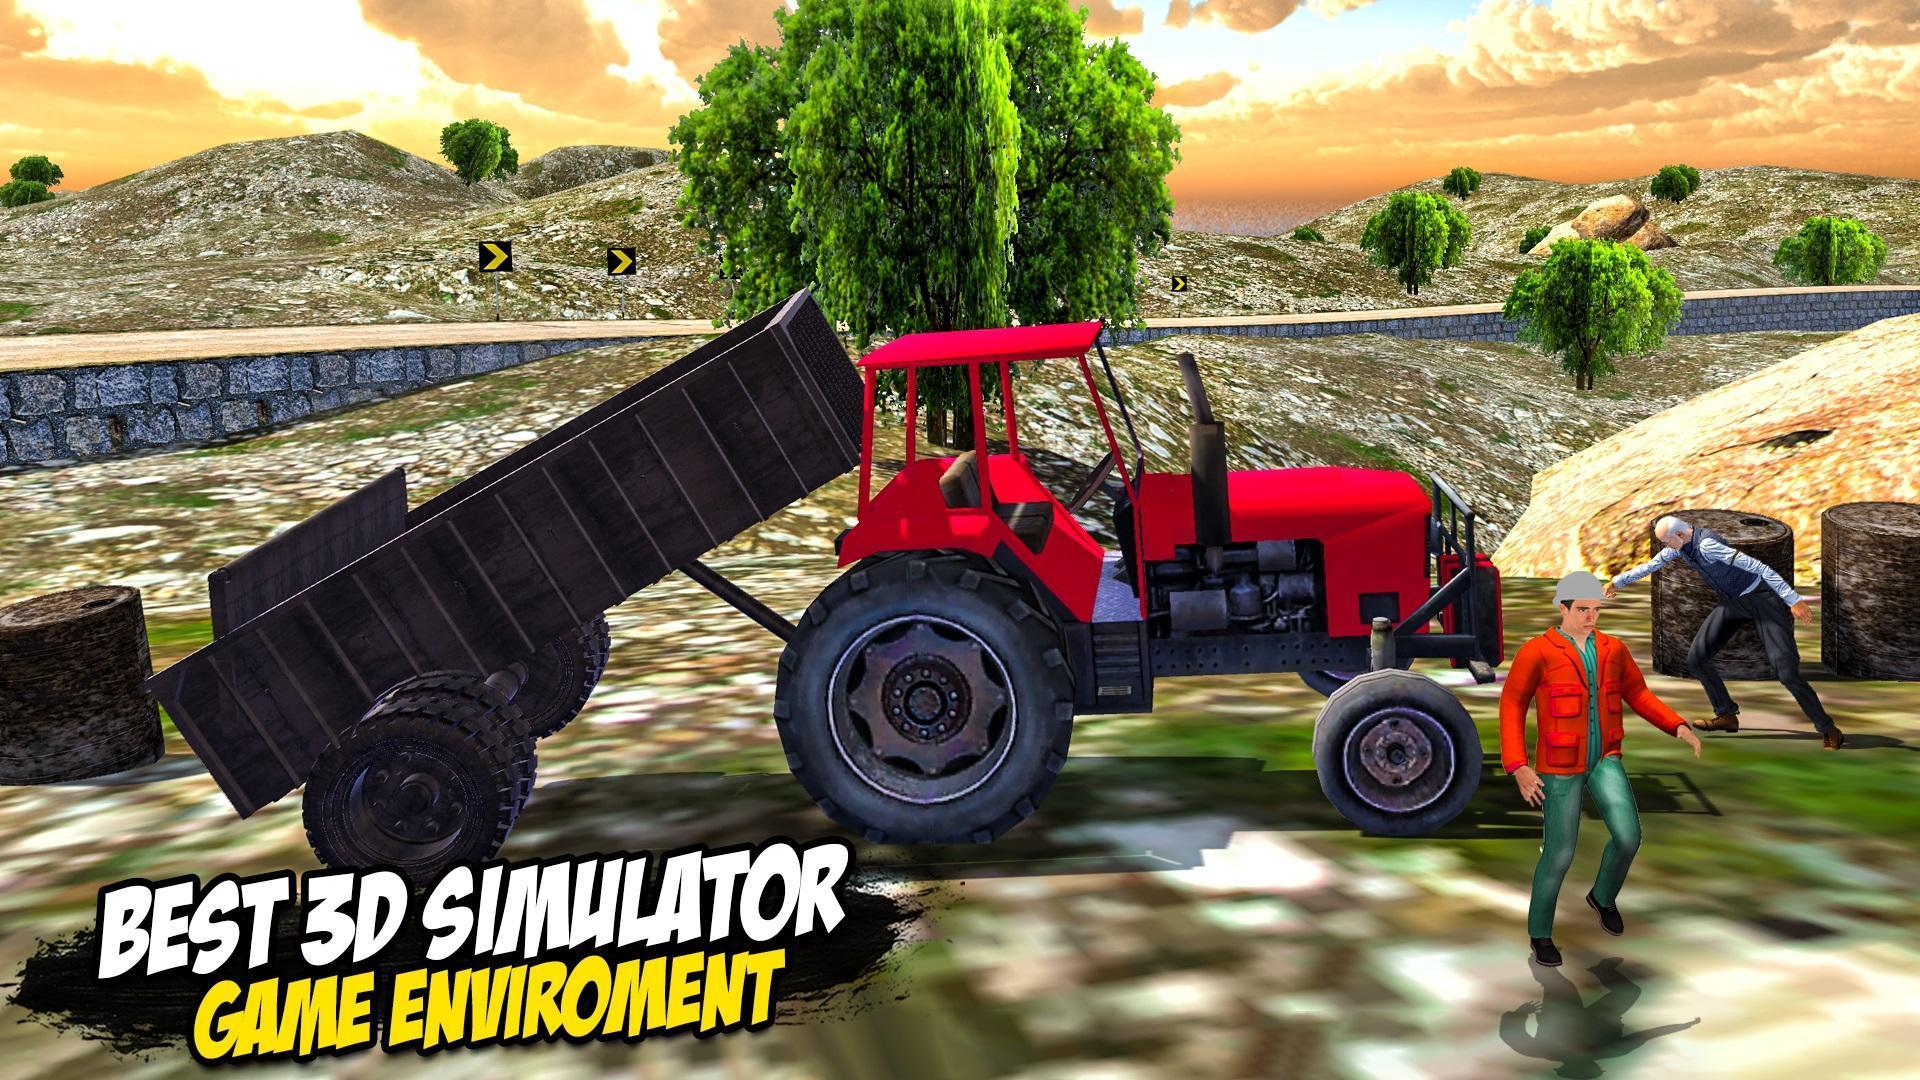 Heavy Tractor Trolley: Tractor Cargo Simulator🚜🚜 3.1 Screenshot 11